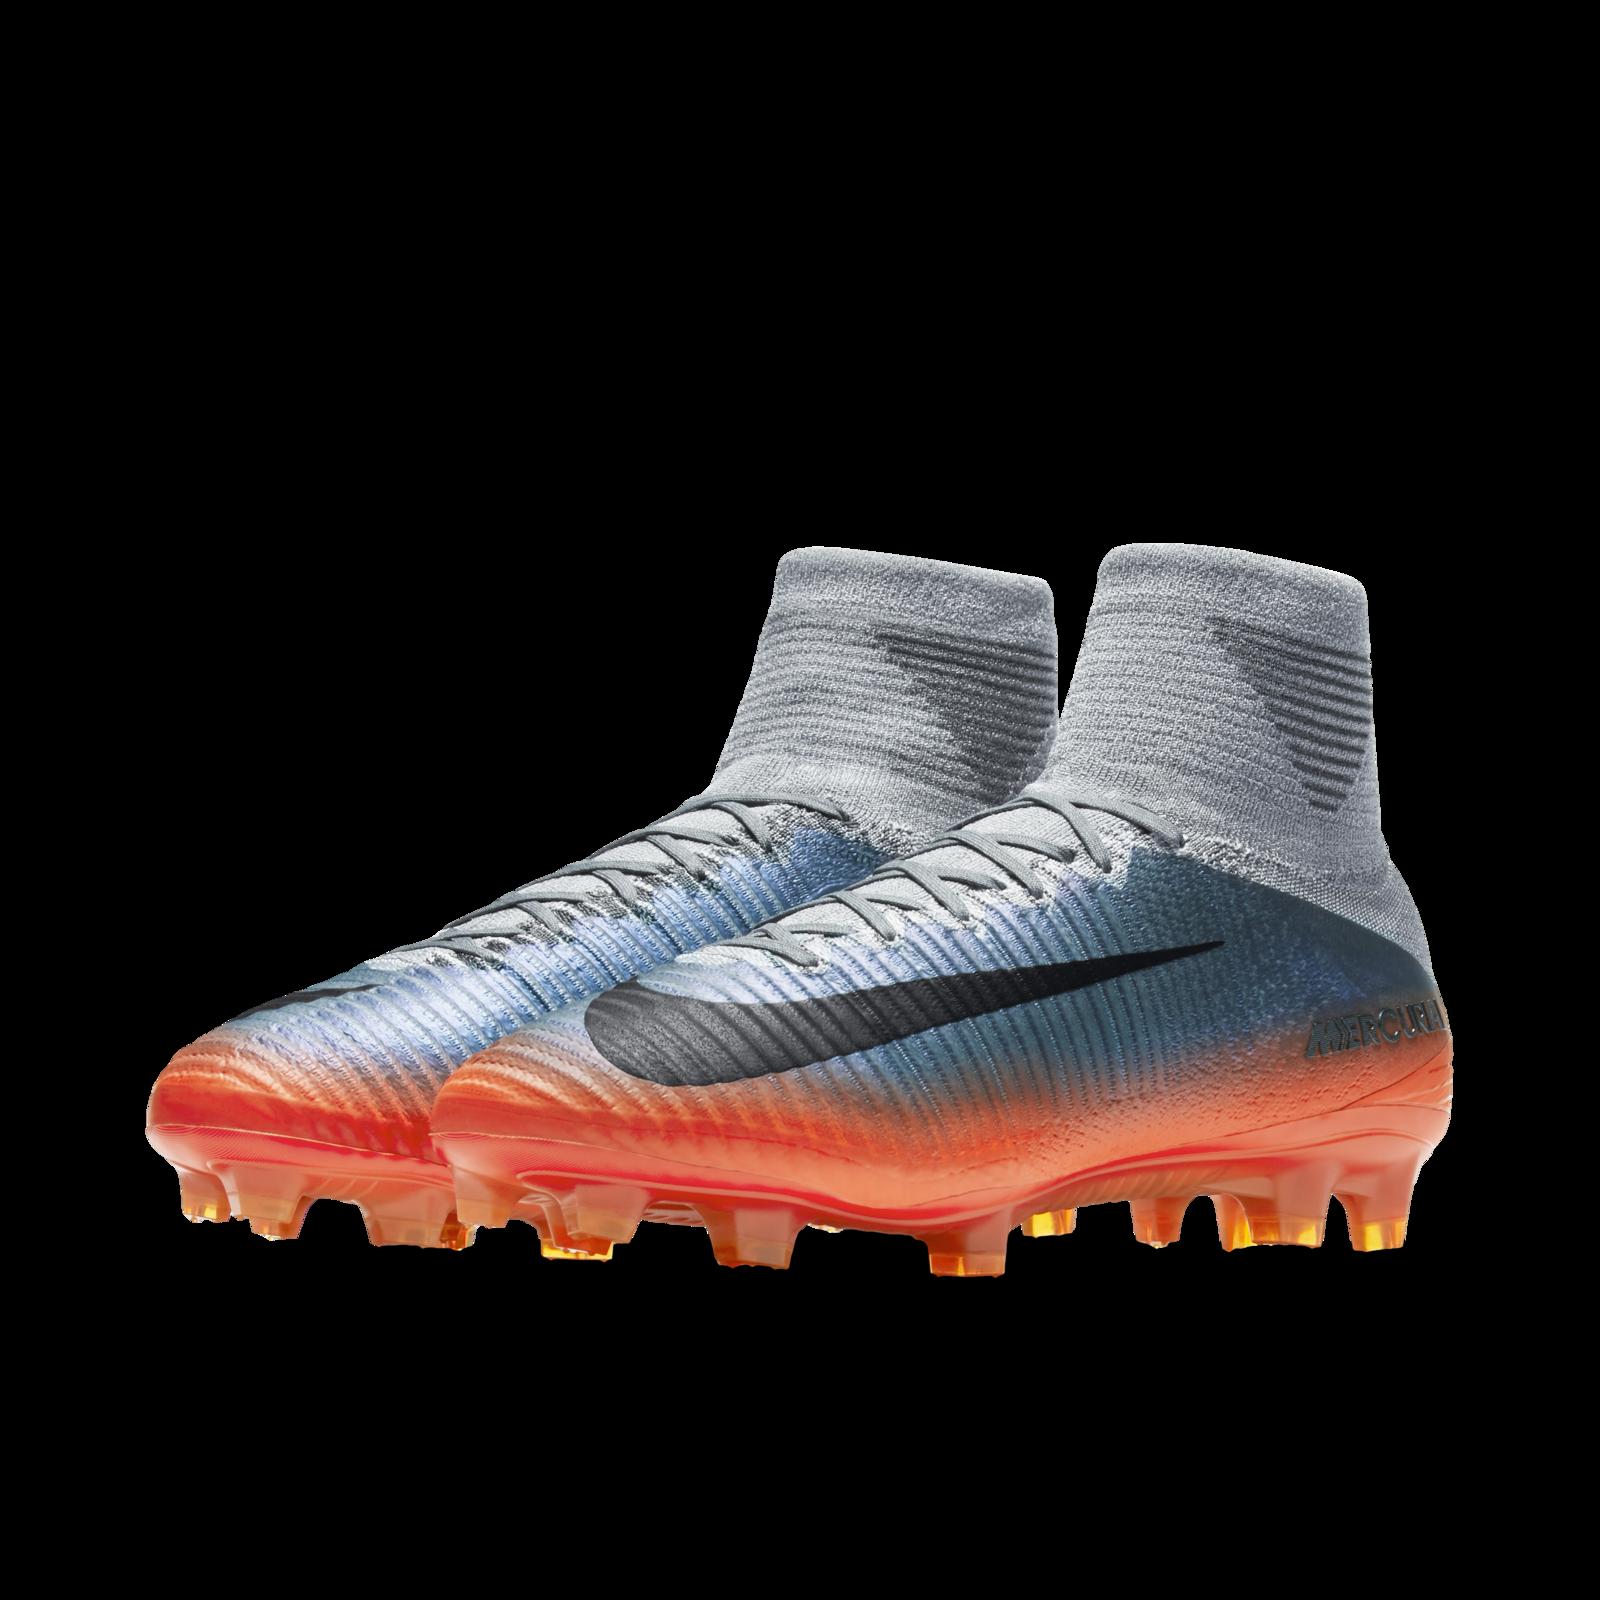 Nike Mercurial Superfly V Cr7 Chapter 4 Fg Cool Grey Orange Metallic Hematite 89 00 Cheap Soccer Shoes Ni Soccer Shoes Cheap Soccer Shoes Trending Shoes